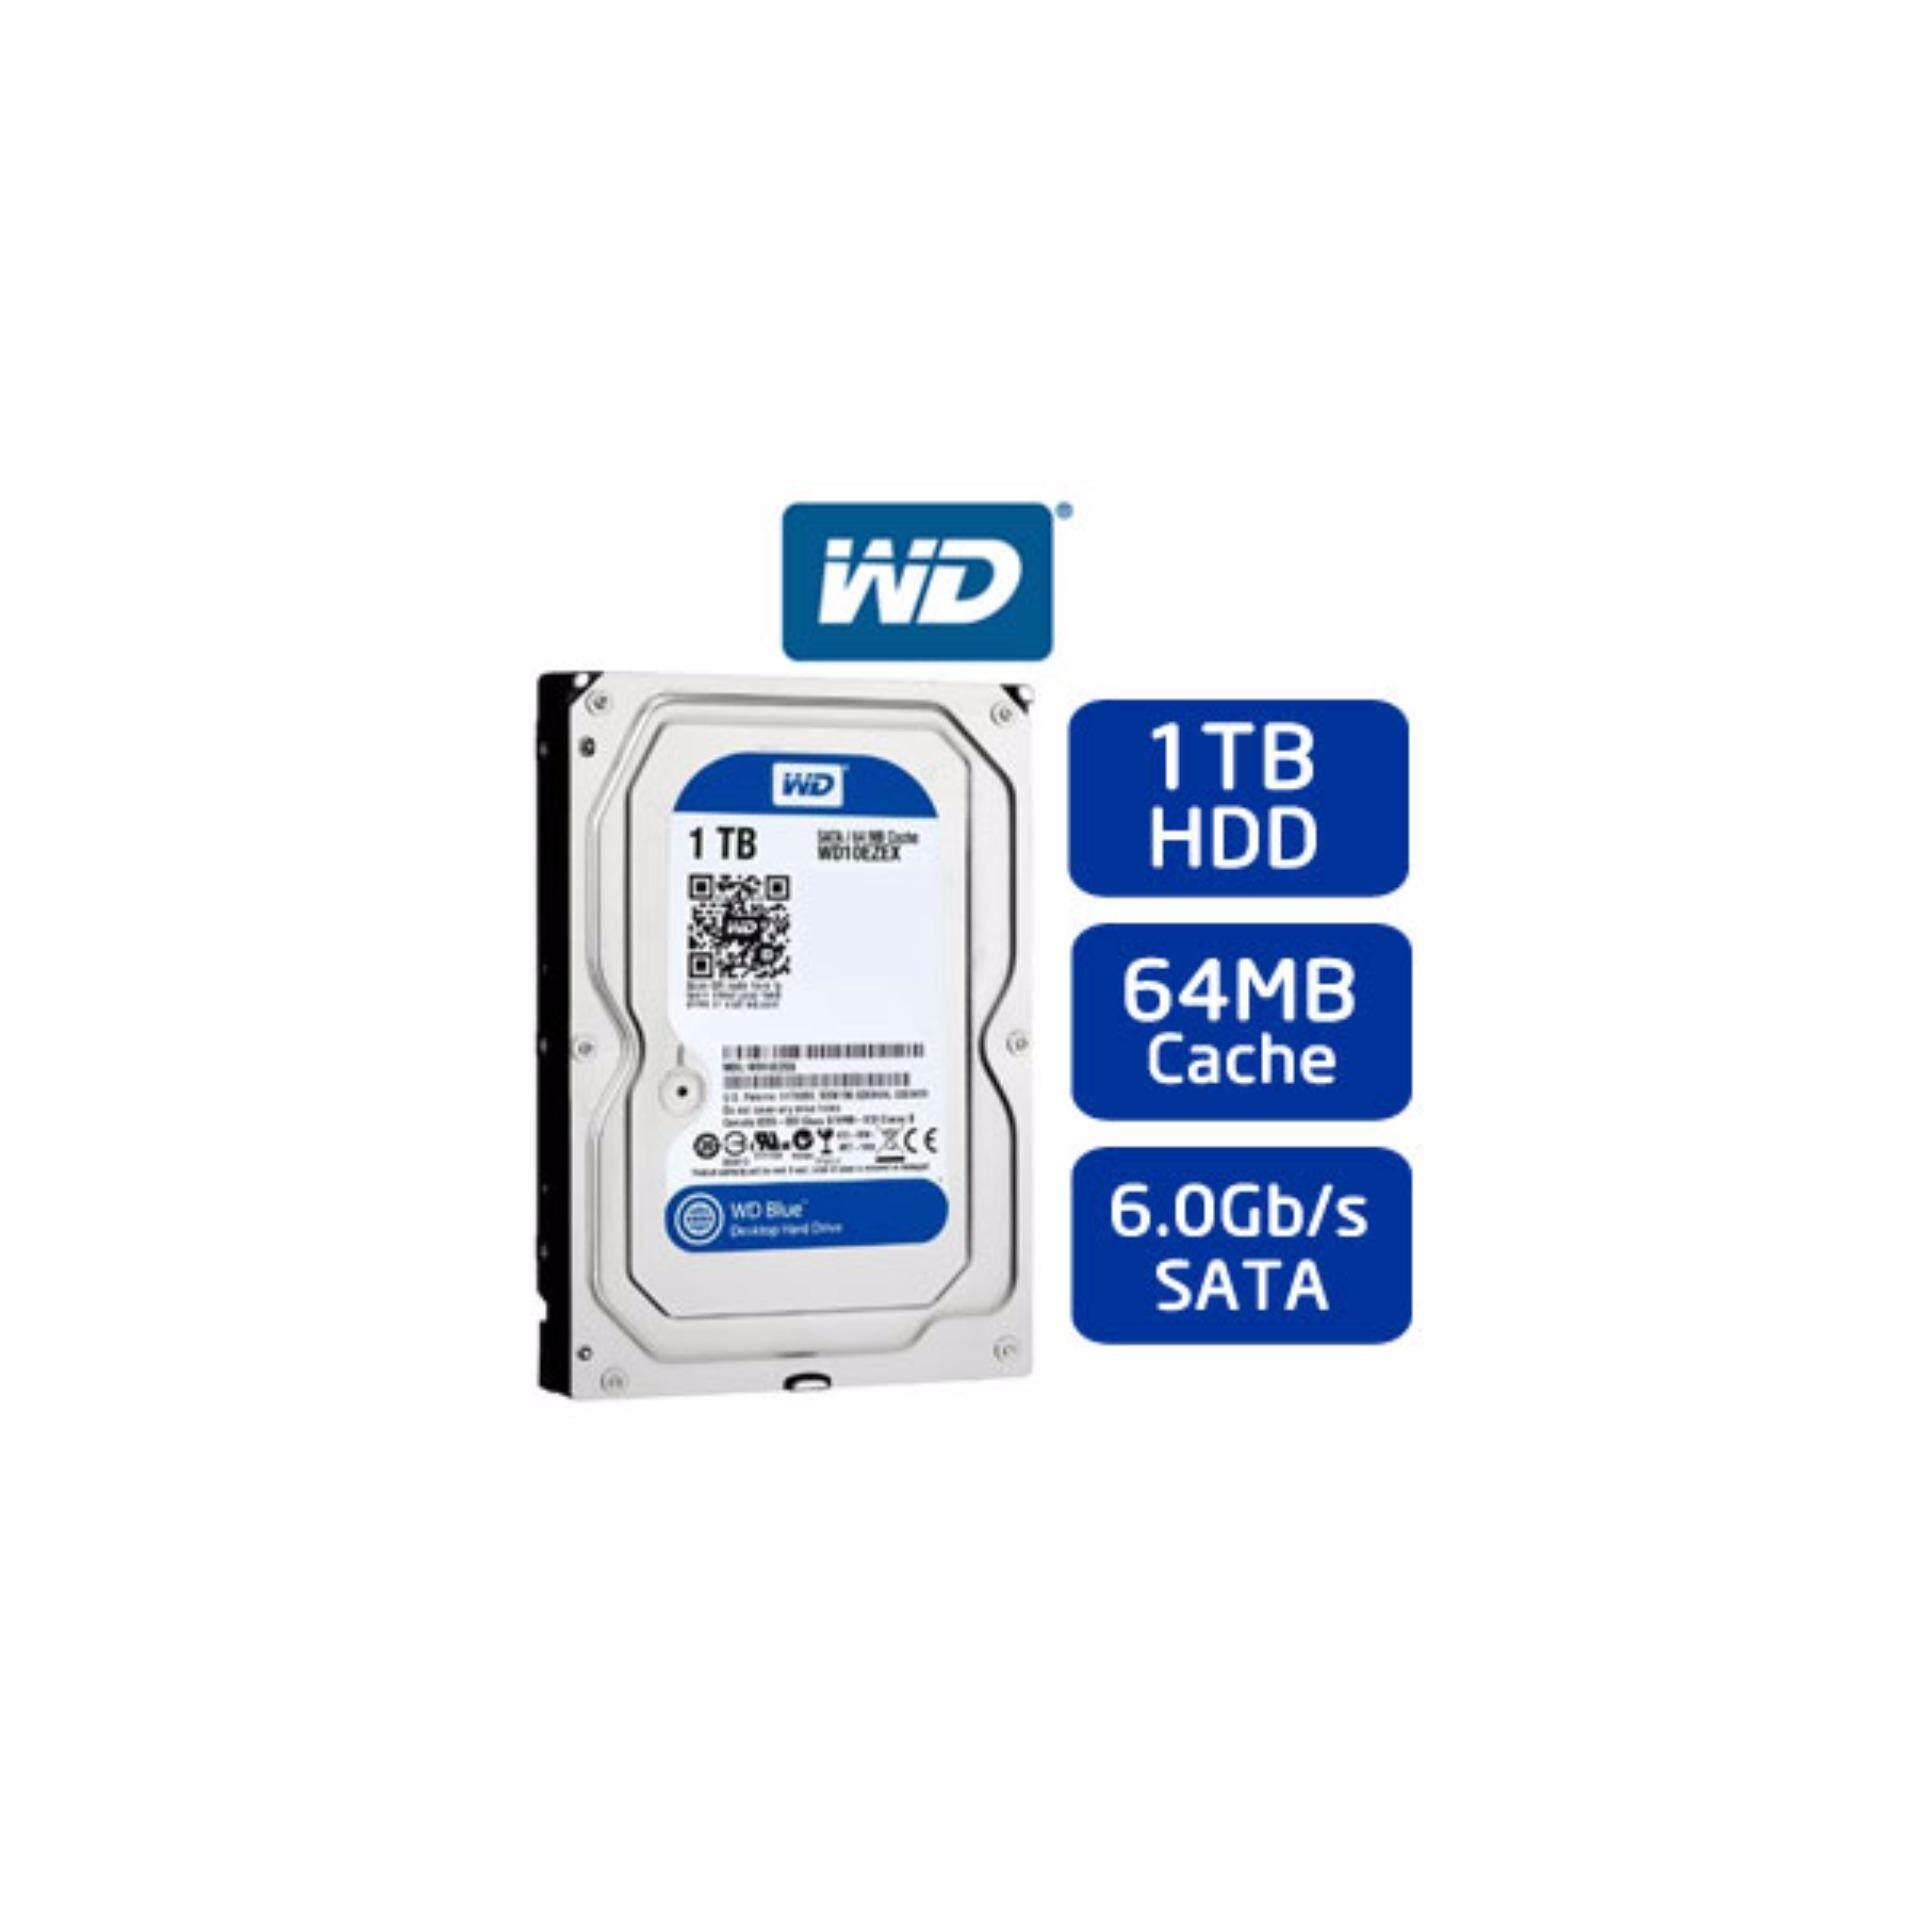 Wd 1tb 35 Harddisk 7200 Rpm Blue Malaysia Hardisk Pc 320gb Sata